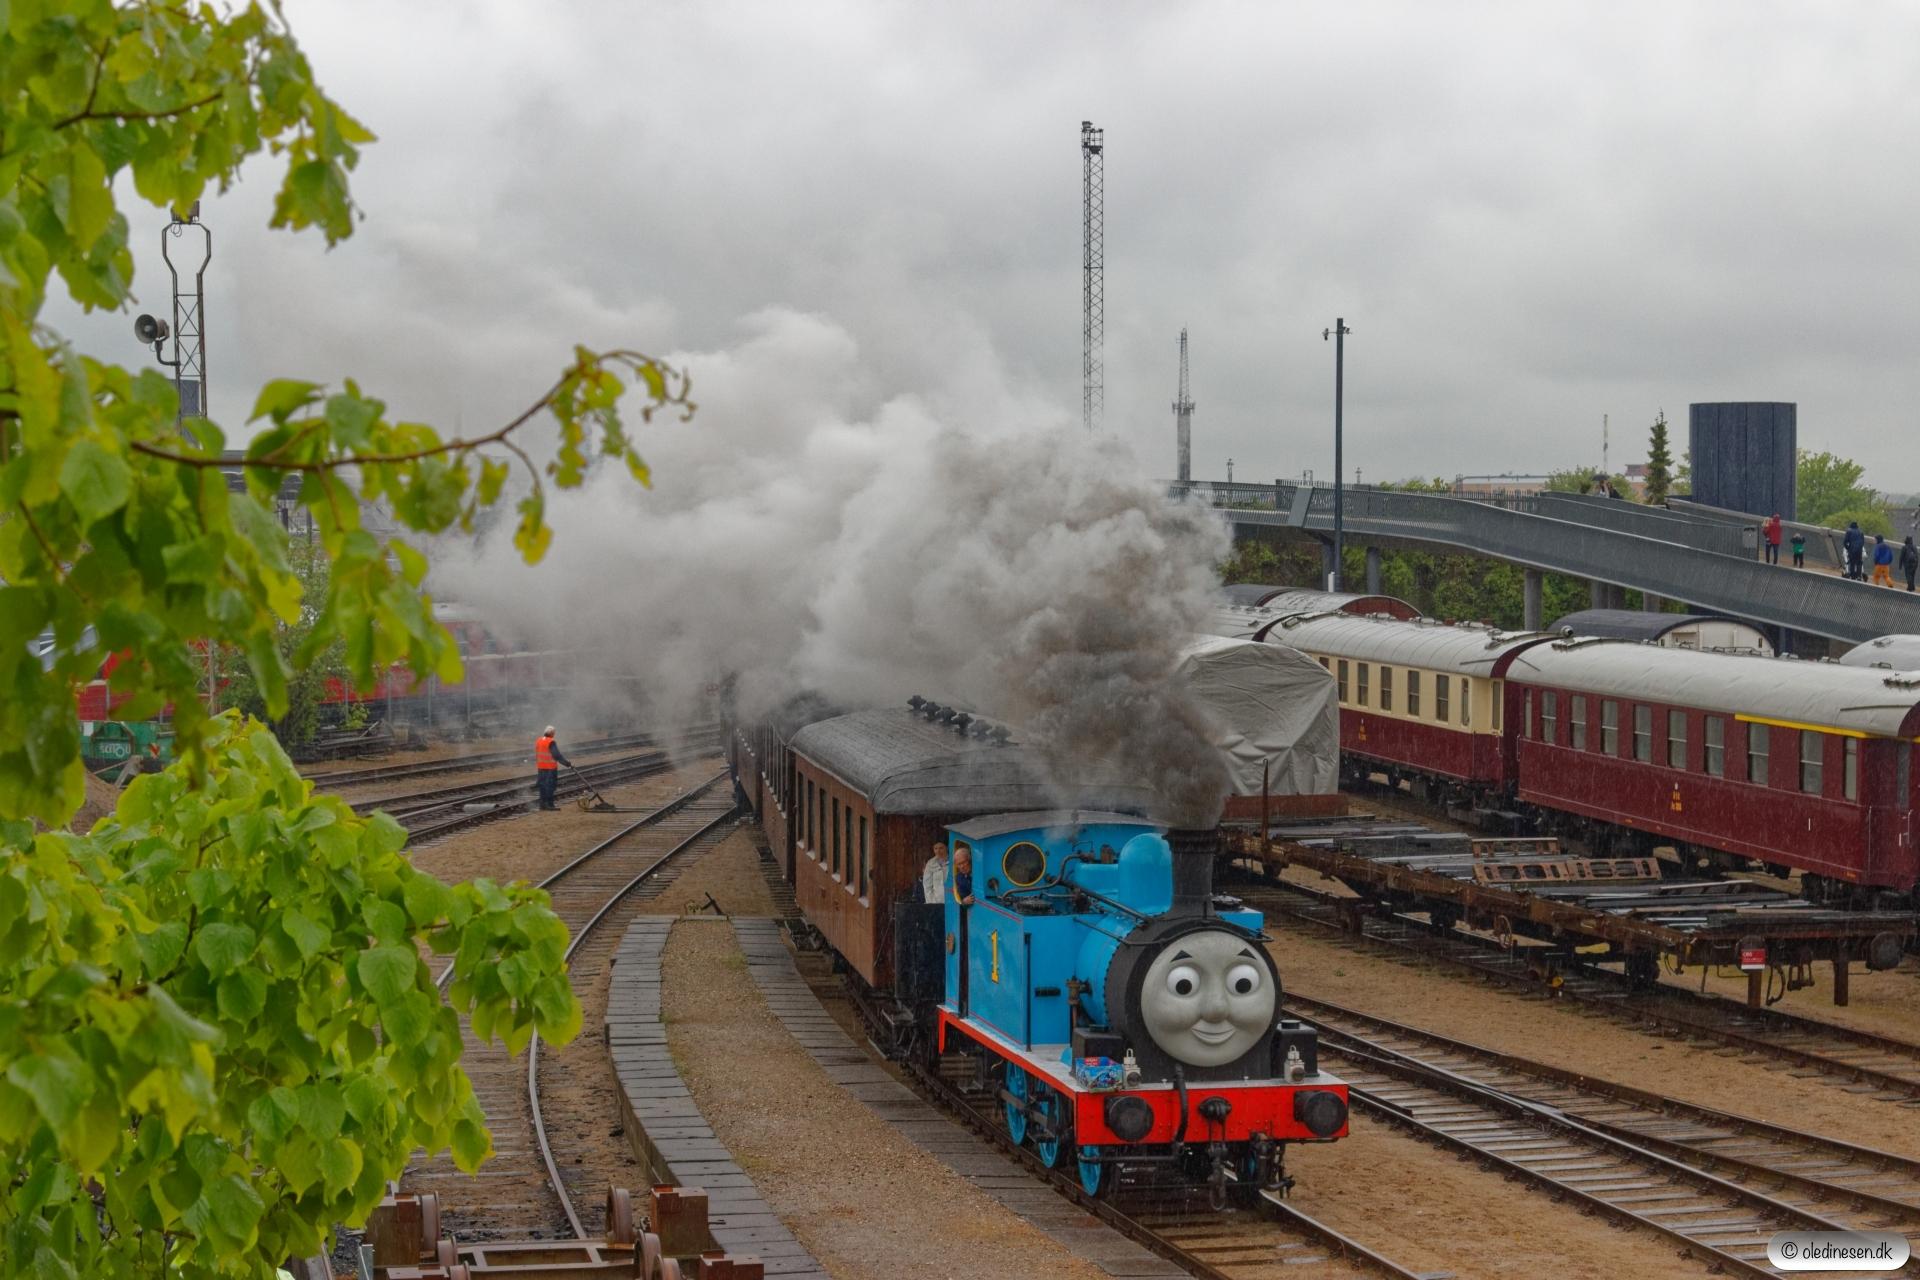 East Lancashire Railway Gothenburg 32+OMB C 16+KS C 3+TKVJ C 21+HHJ C 25. Odense 17.05.2019.